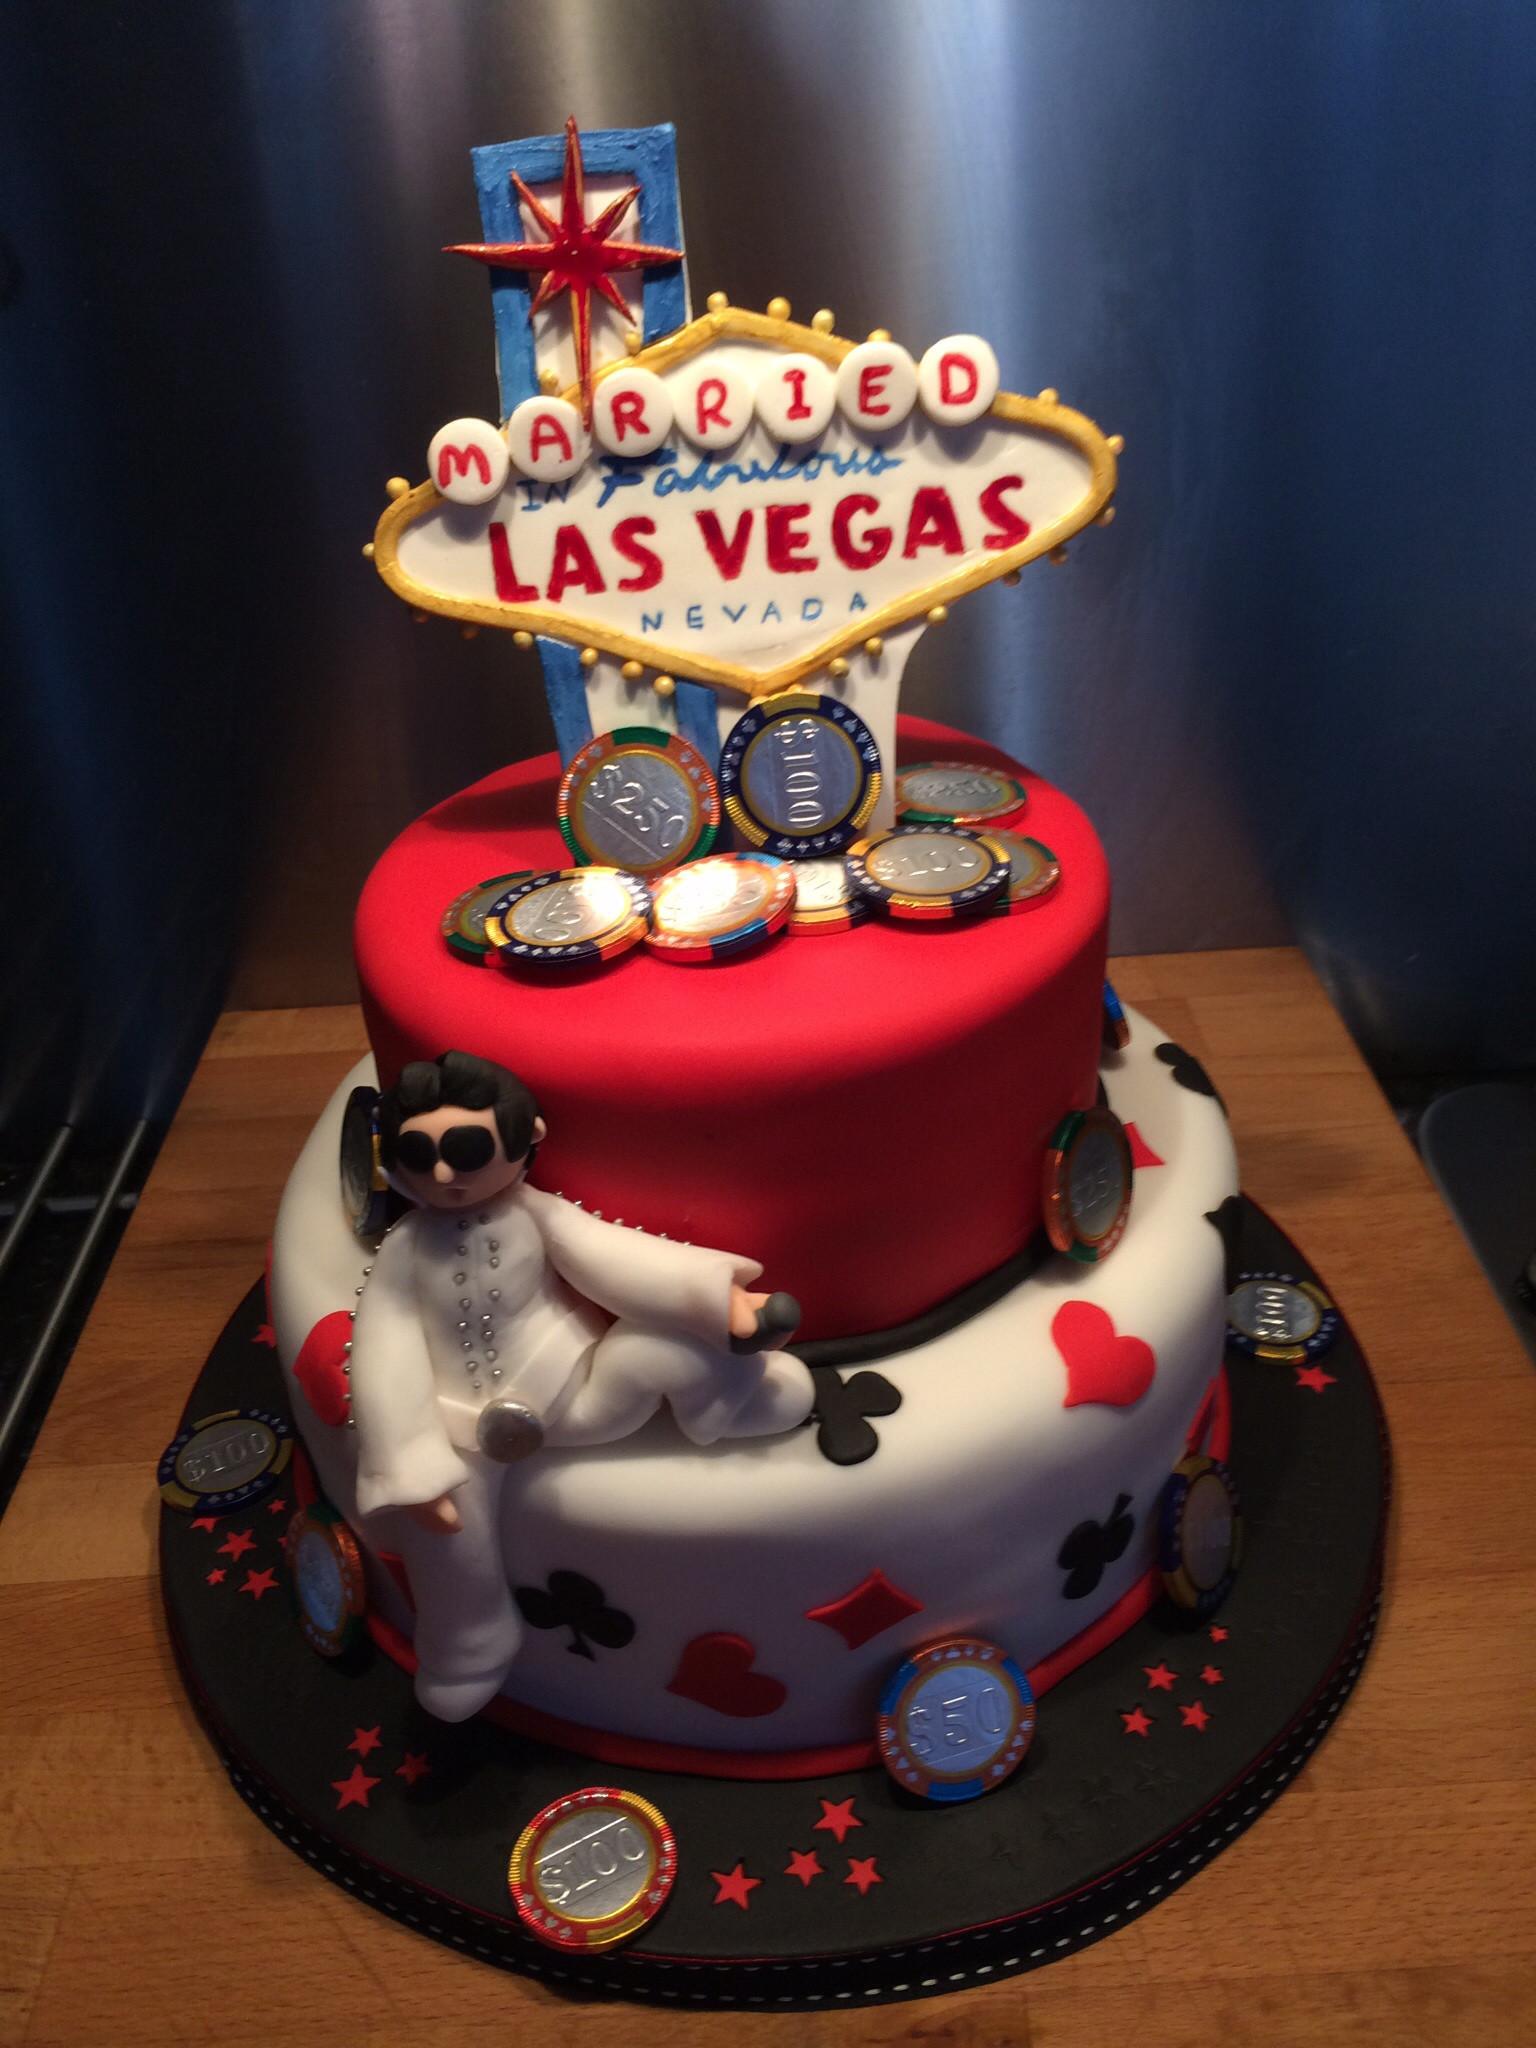 Best Wedding Cakes Las Vegas  Wedding cake las vegas idea in 2017